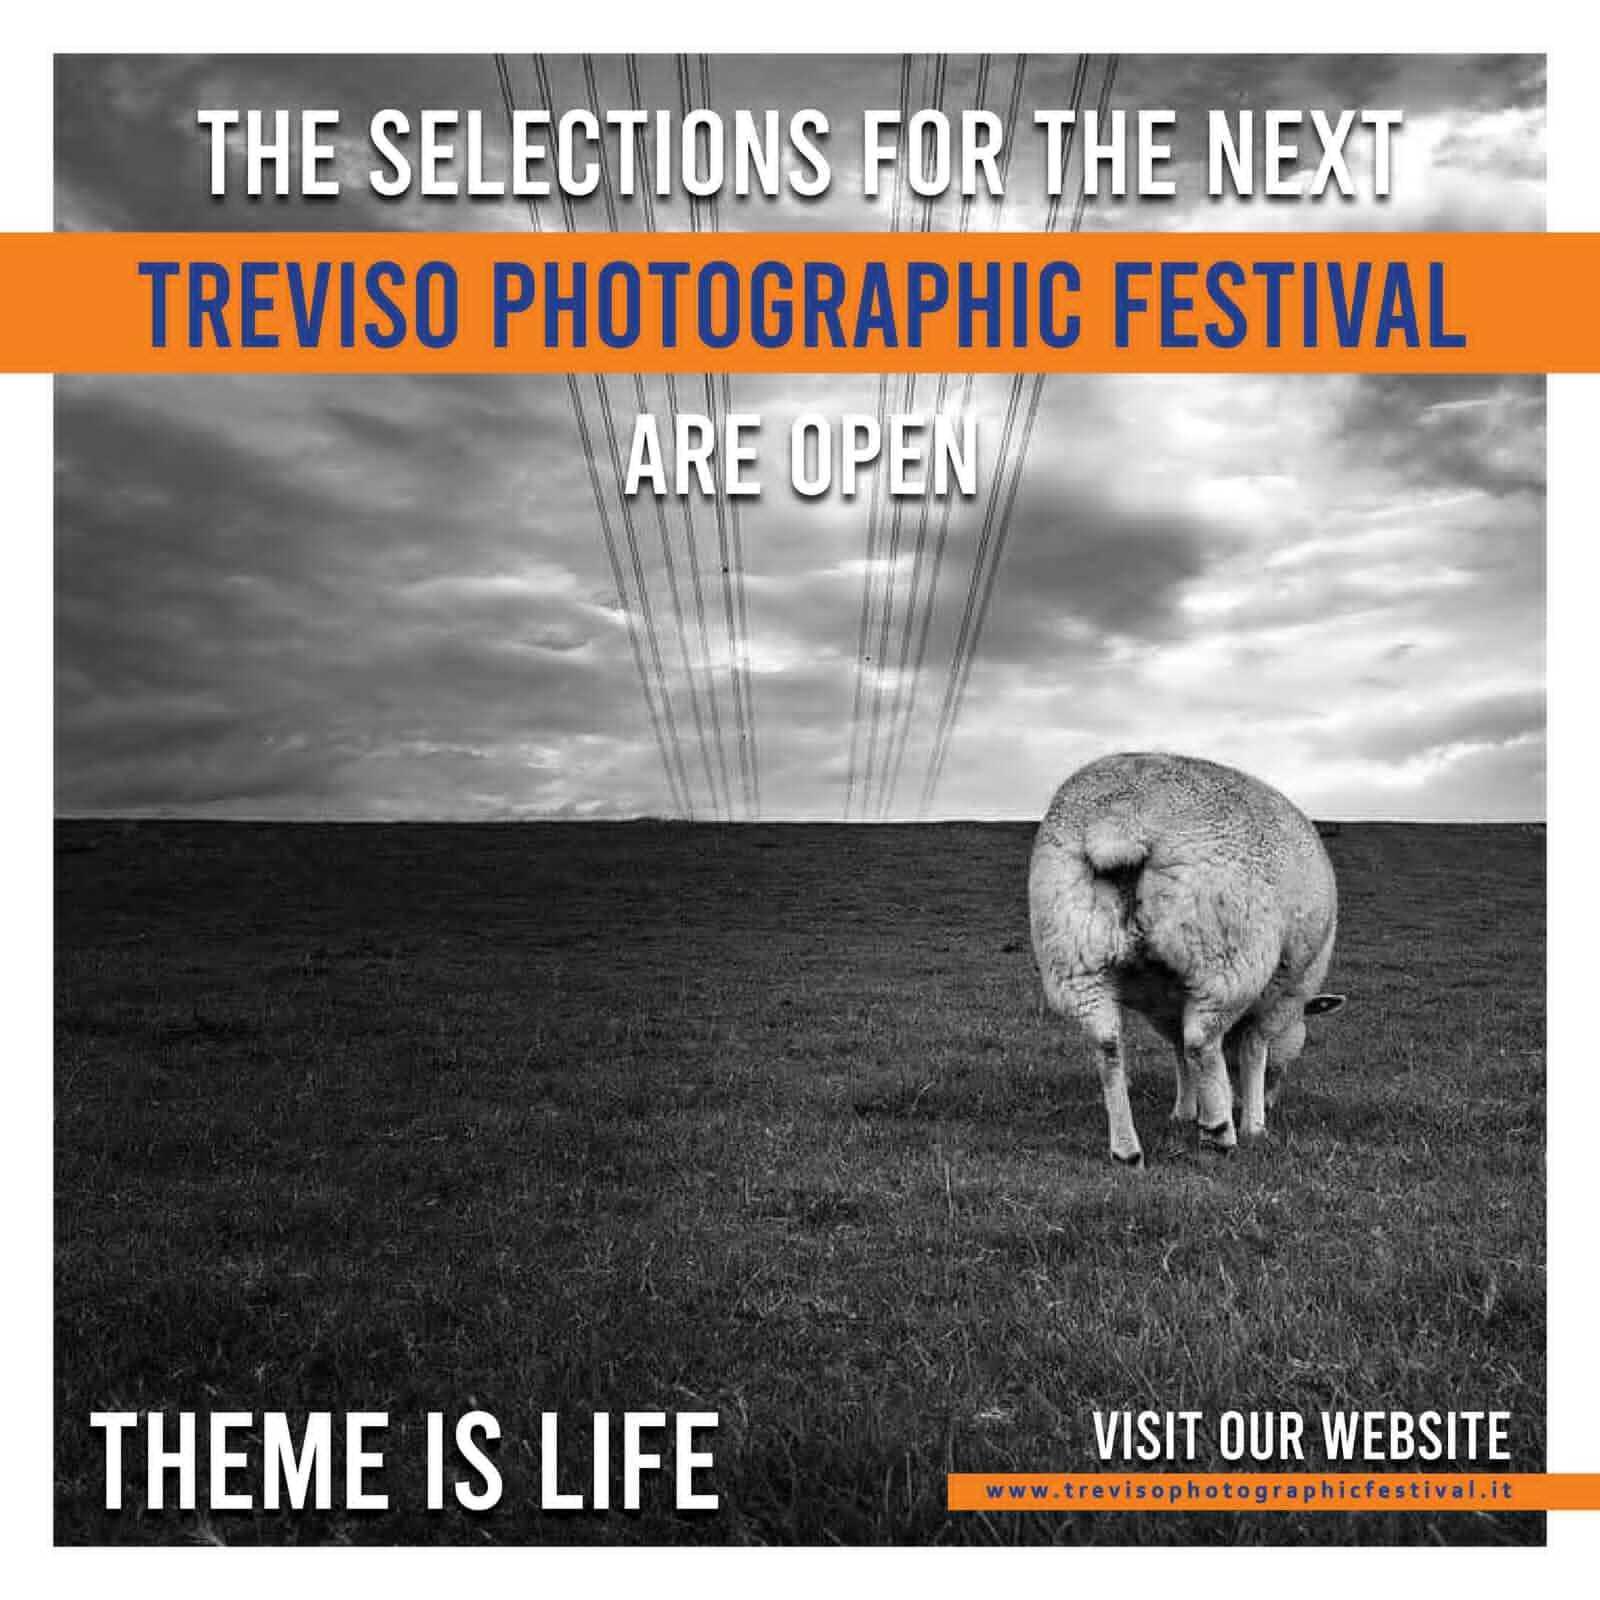 trevisophotographicfestival